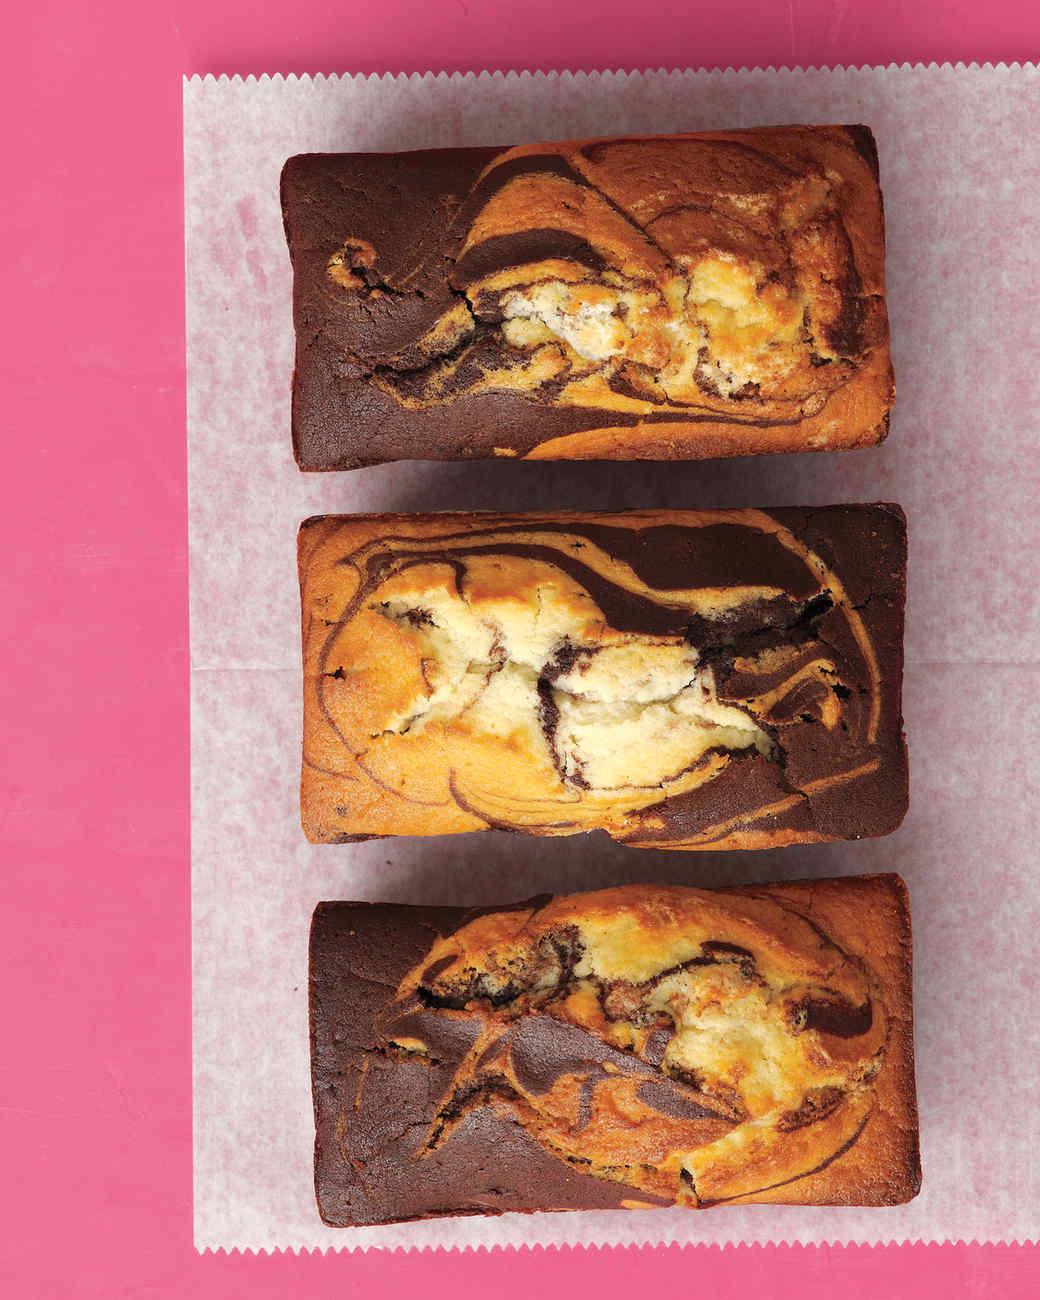 chocolate-vanilla-marble-cake-2-med108164.jpg